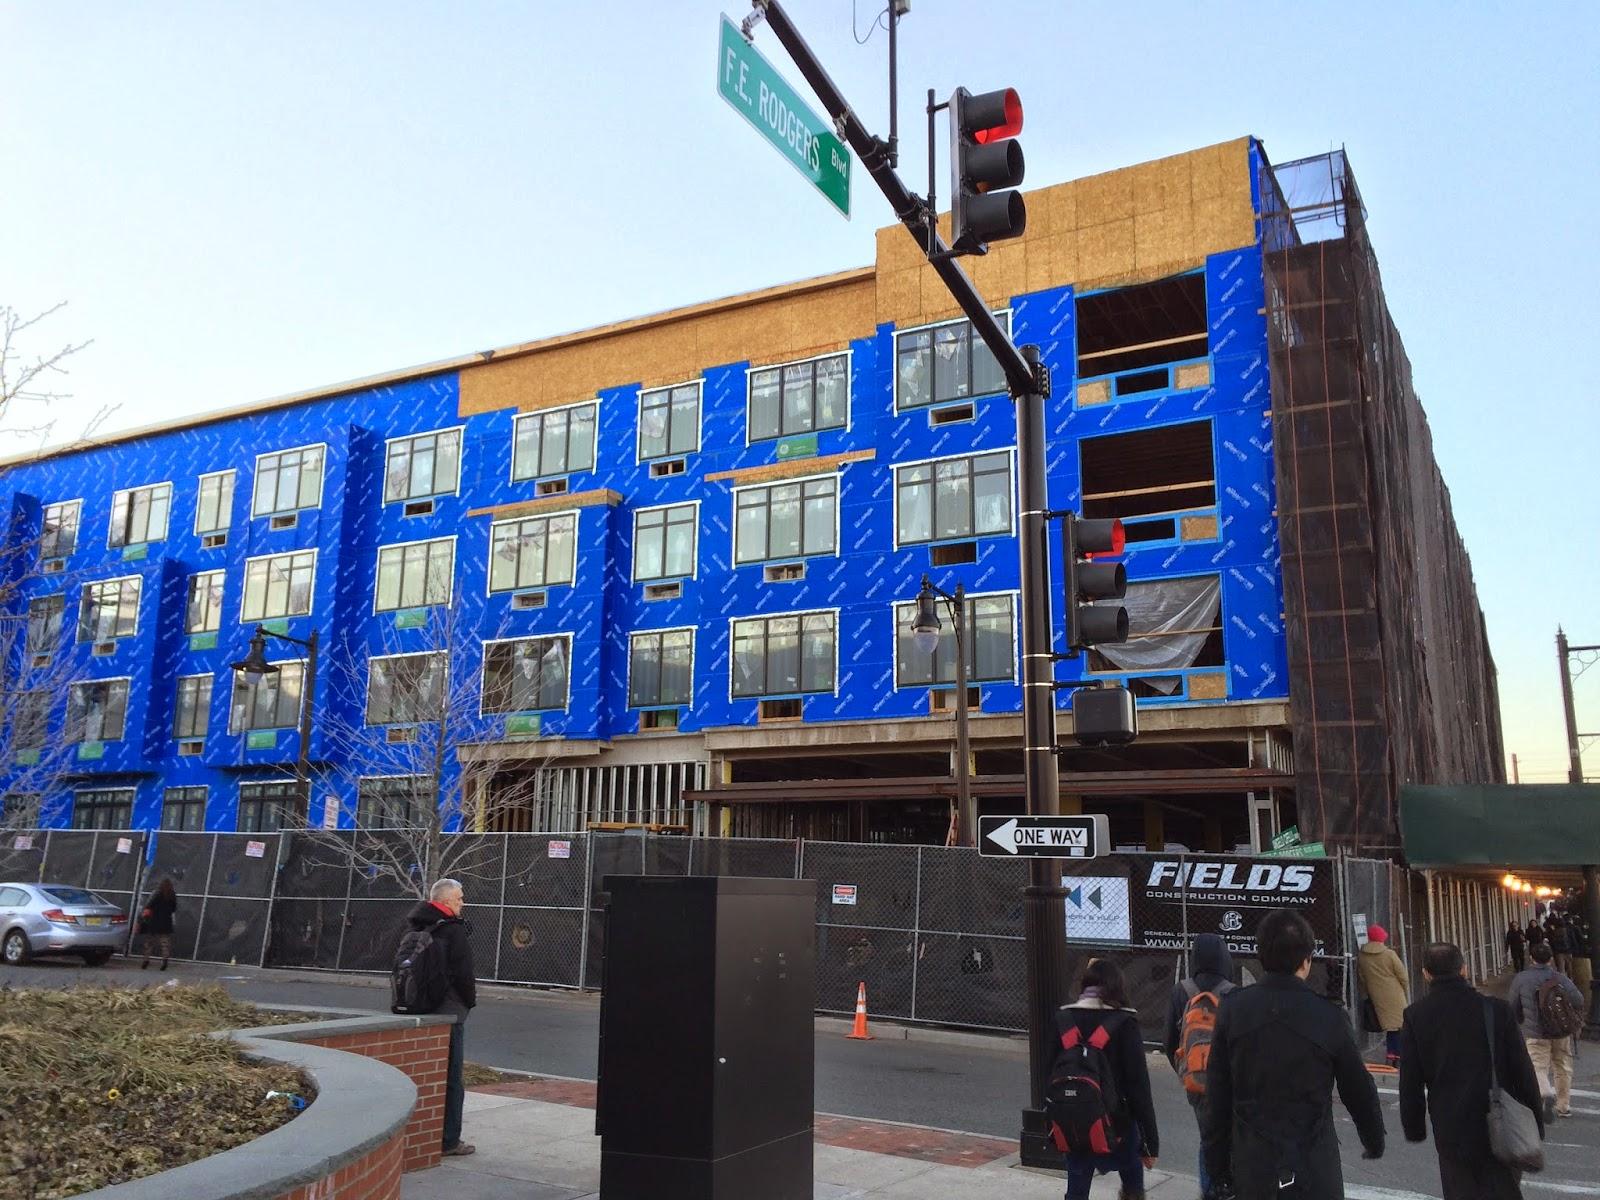 Newark, Harrison, Jersey City, Hoboken | Urbanism vs Modernism